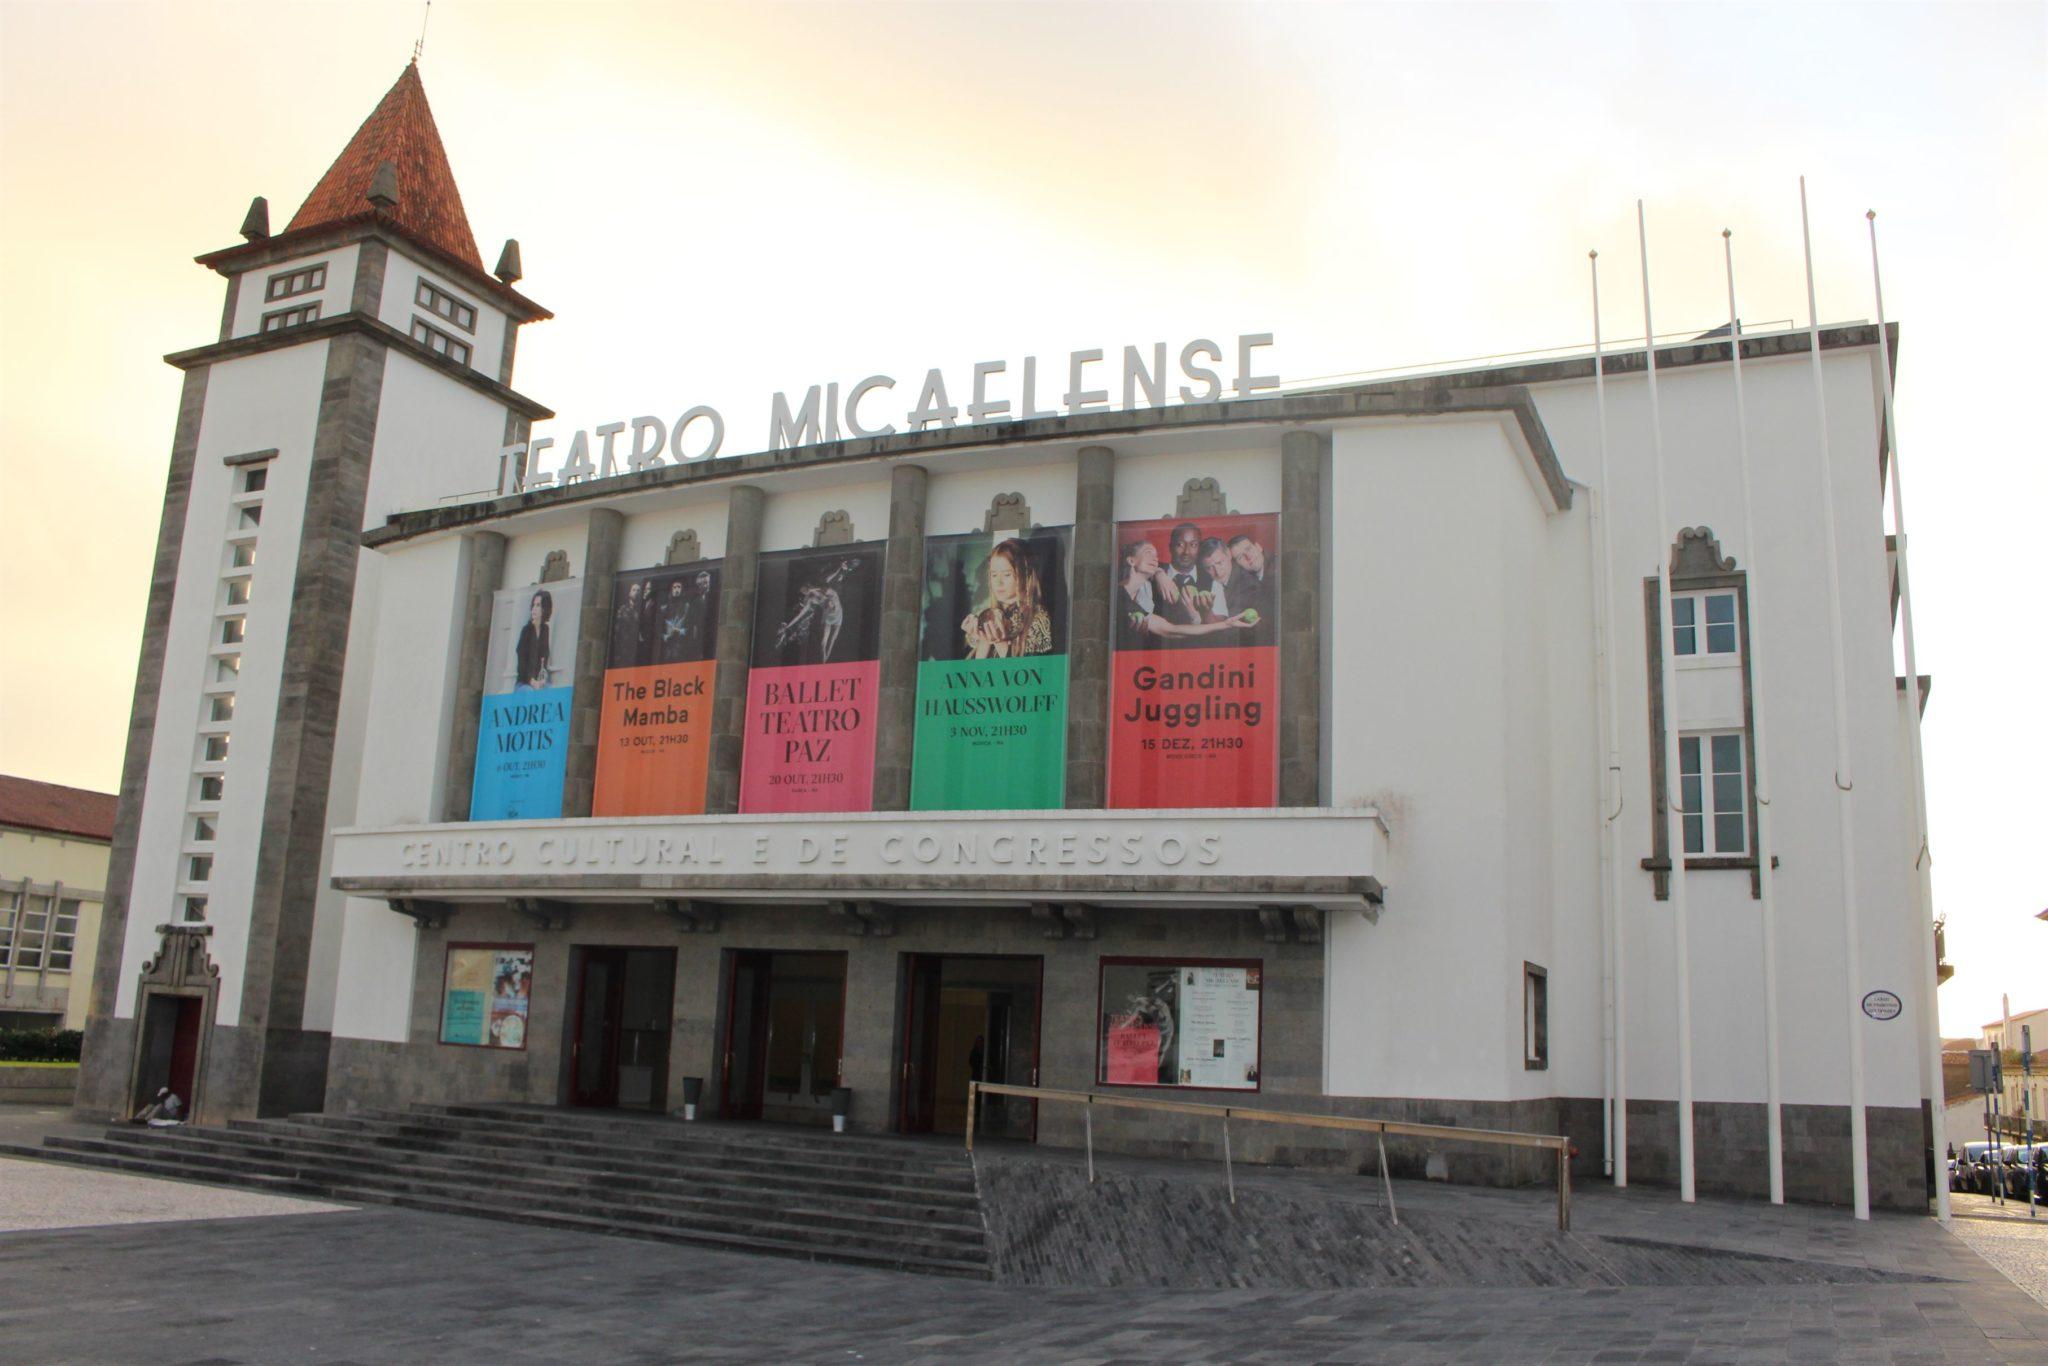 Teatro Micaelense, S. Miguel, Açores